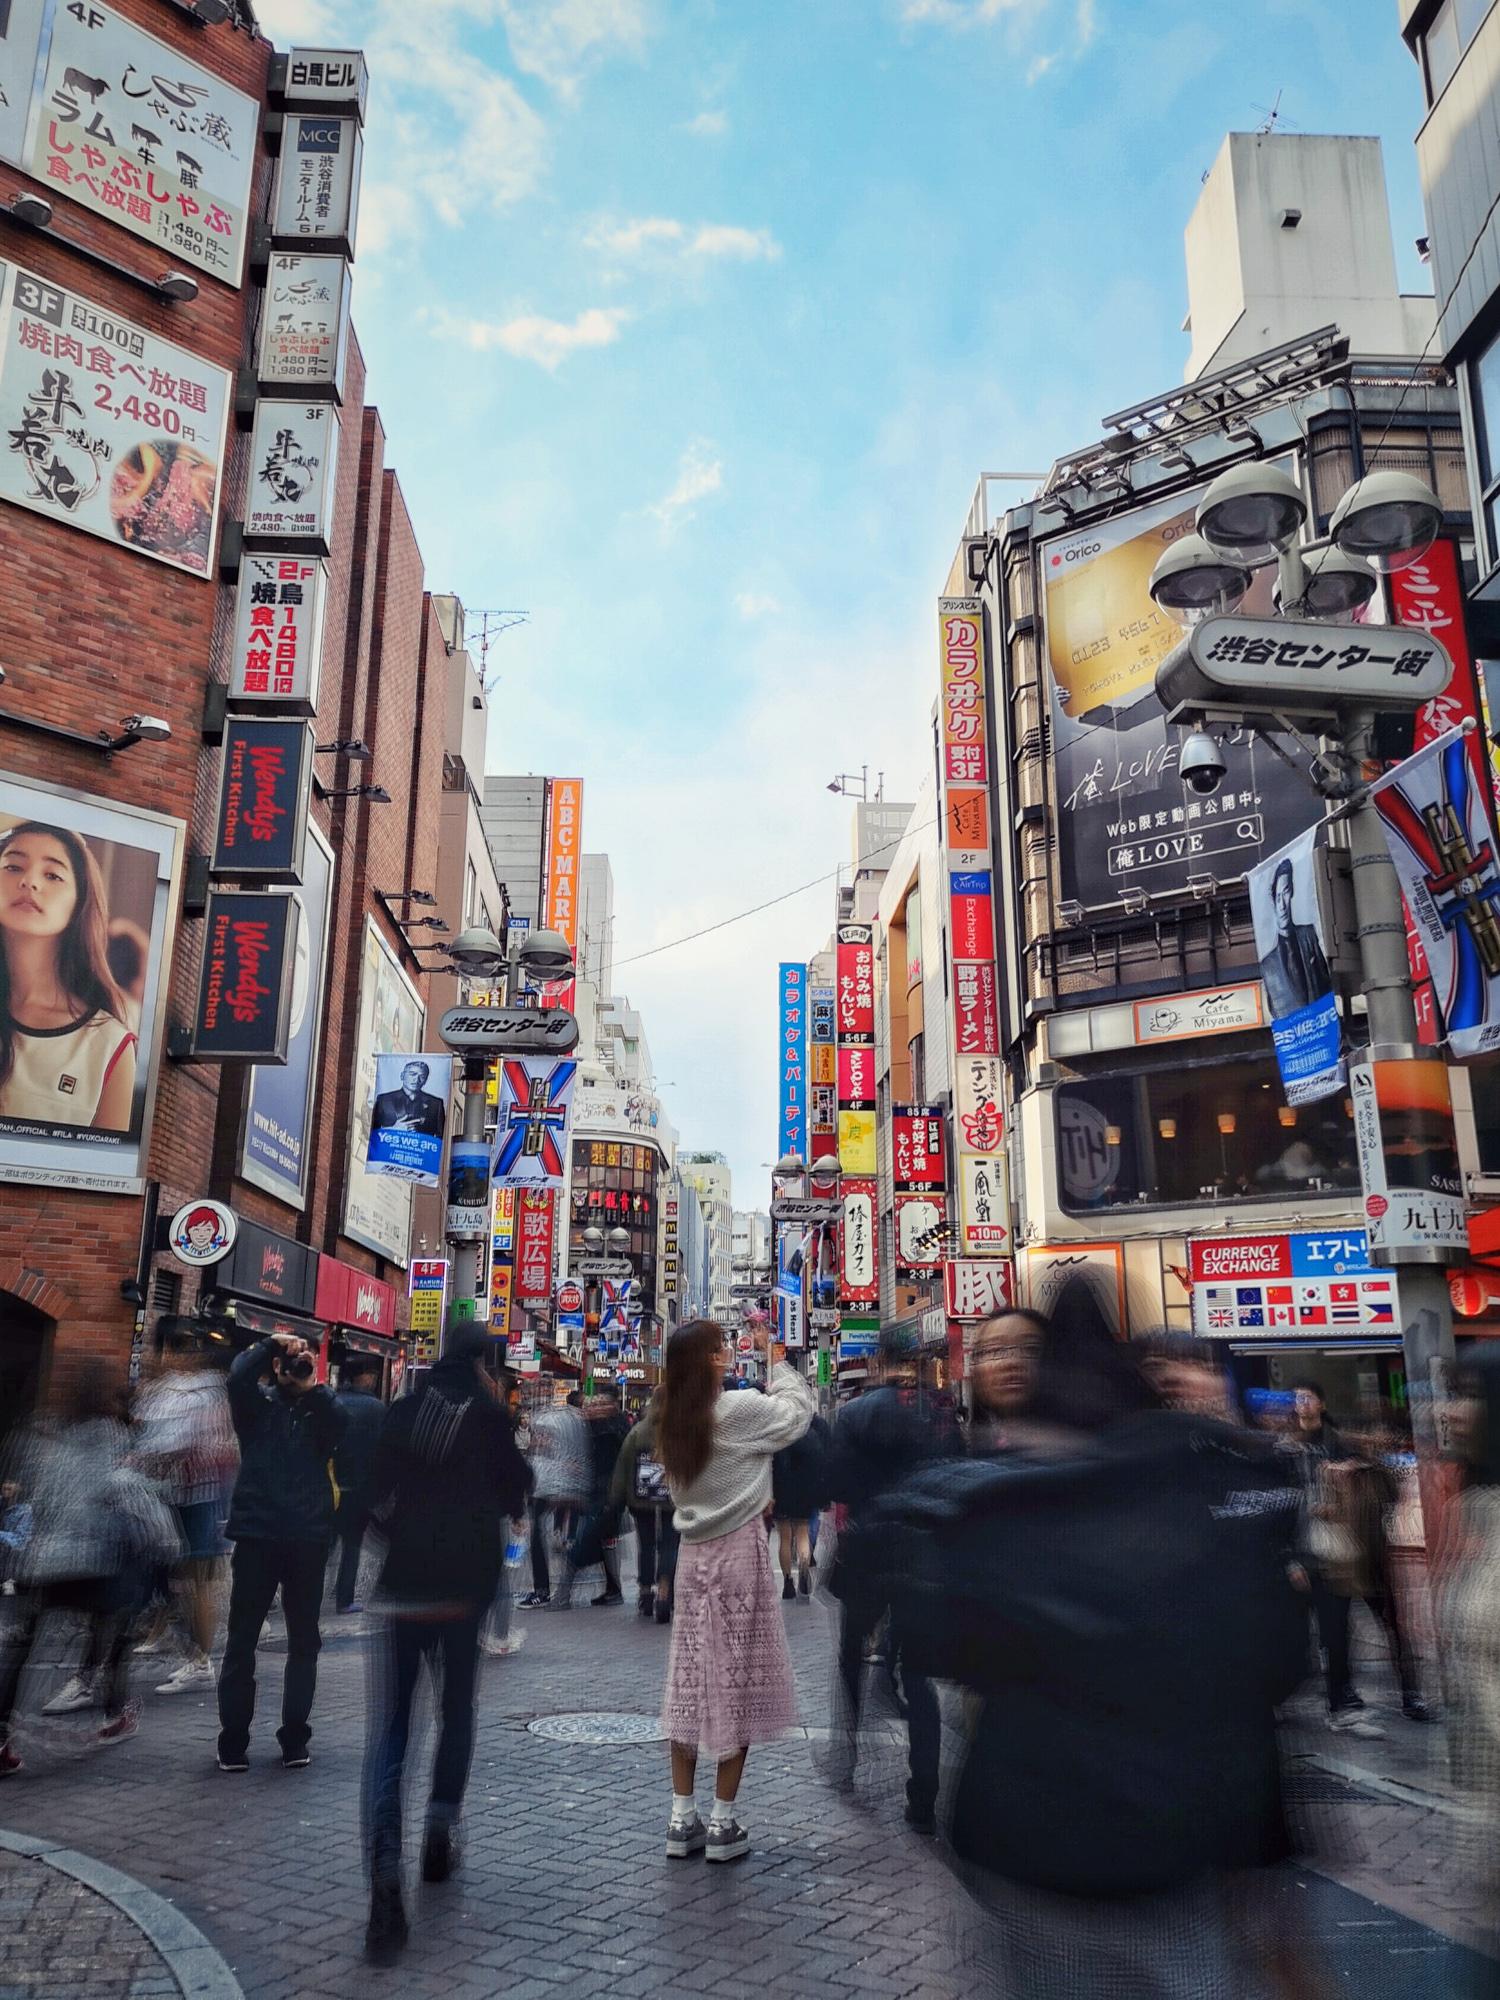 Woman taking a photo in Shibuya, Tokyo. Huawei P20 Pro Light Painting